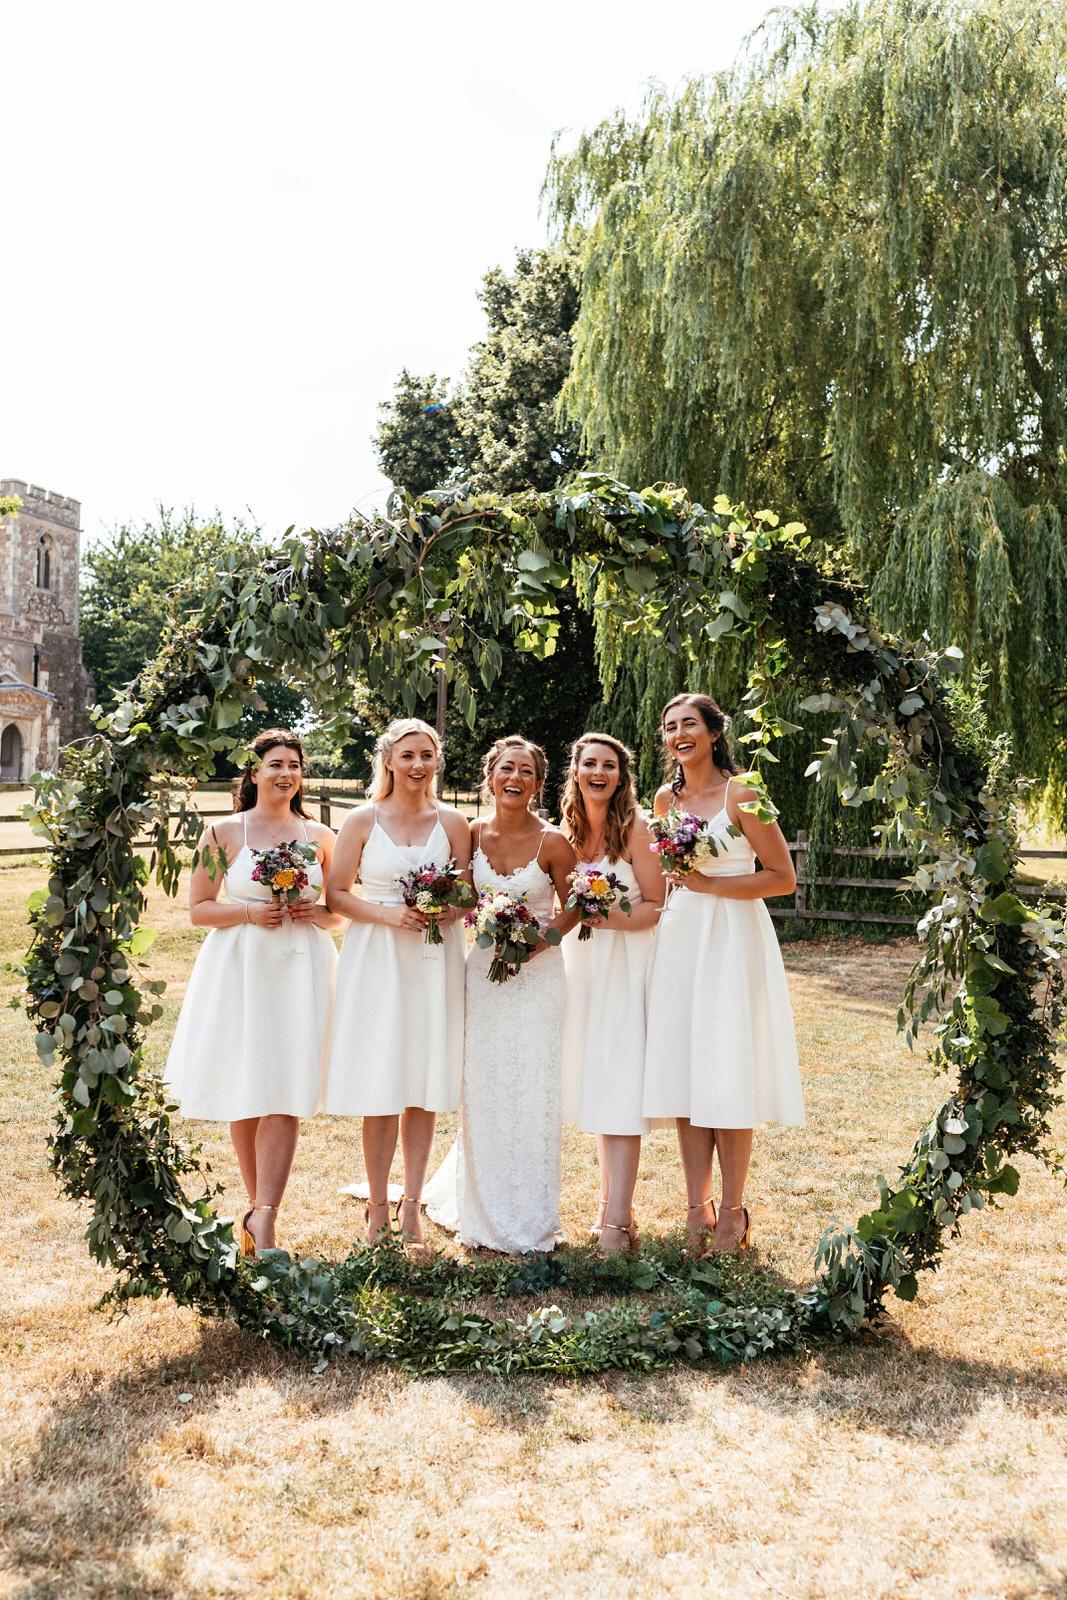 Edworth-Manor-Farm-Wedding-Photographer-039.jpg